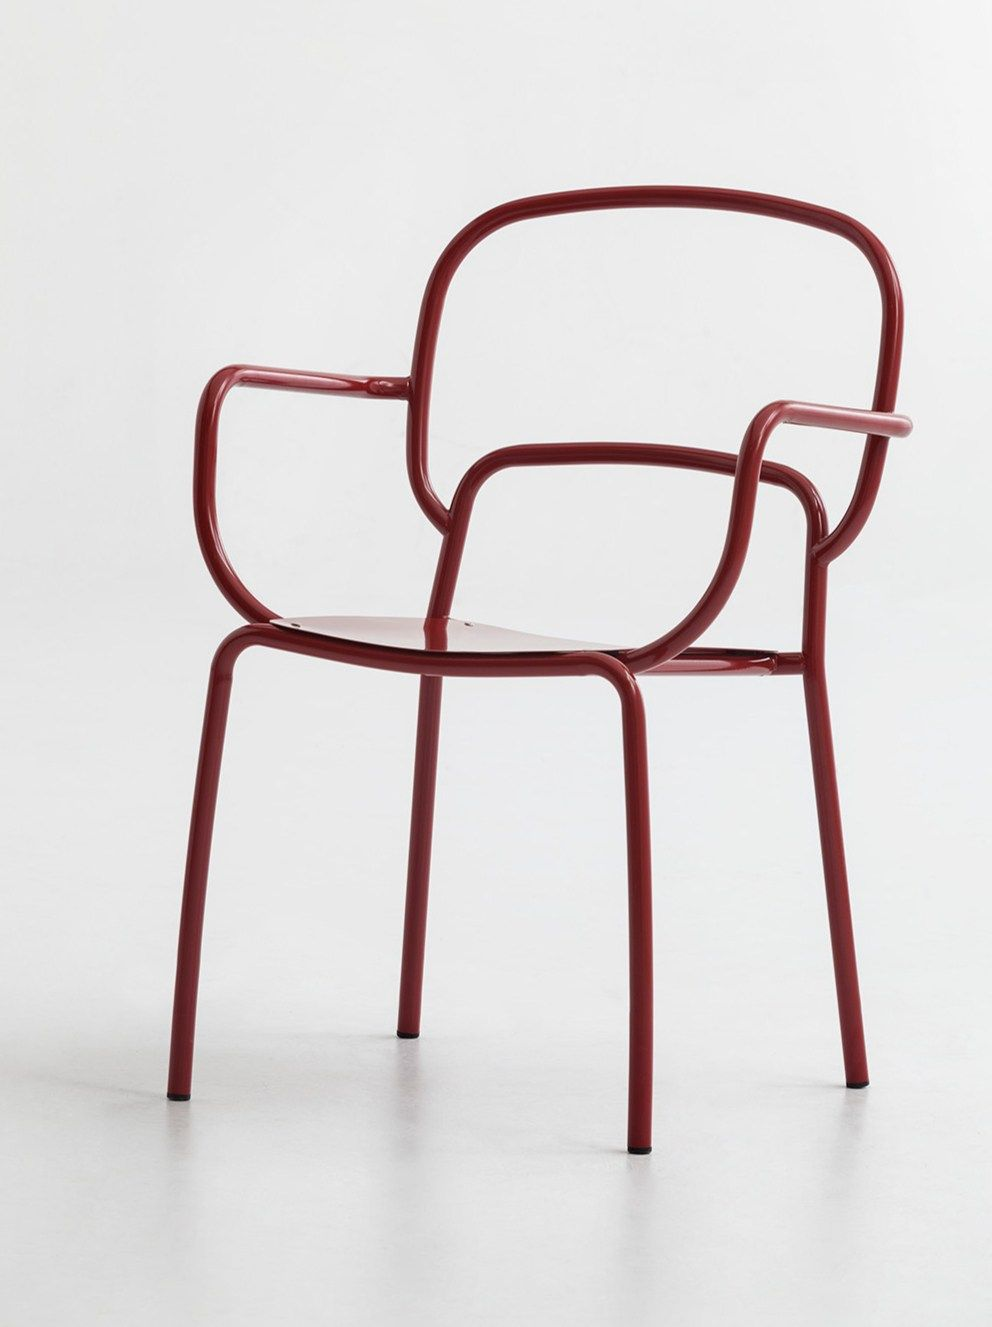 Sedia Studio Design.Moyo Sedie Furniture Metal Chairs Patio Rocking Chairs